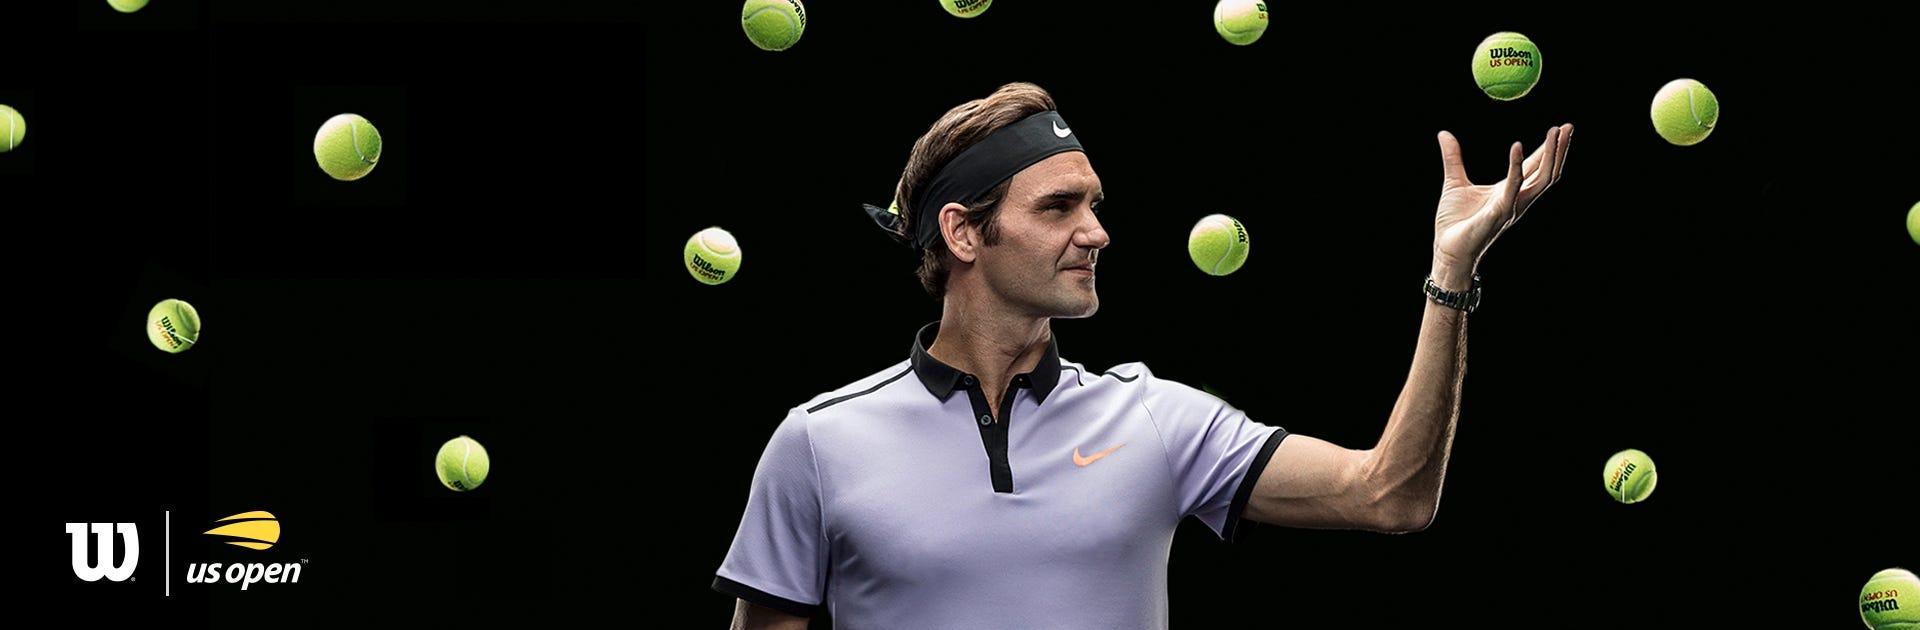 US Open Tennis Ball Sweeps | Wilson Sporting Goods